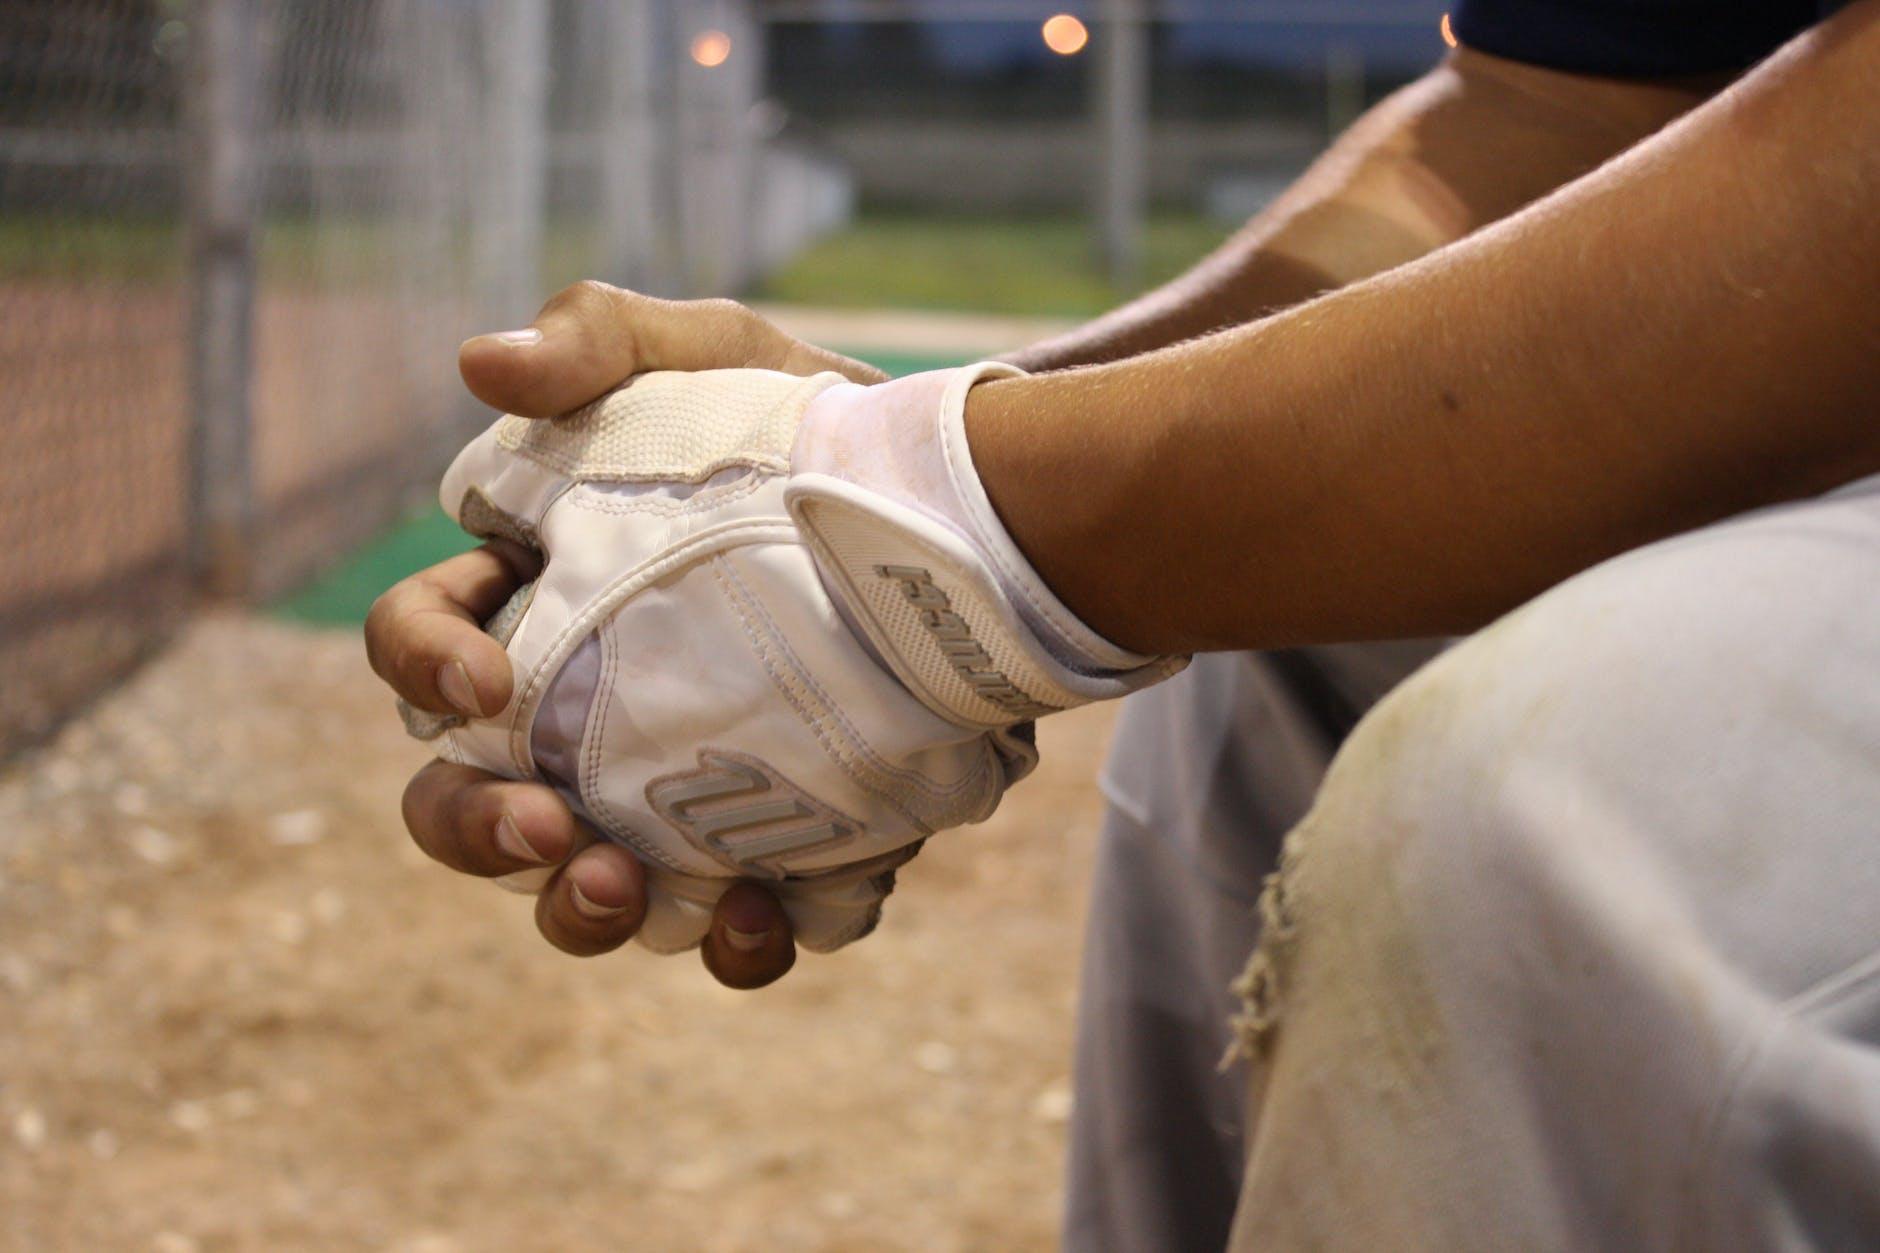 Baseball player sitting near fence